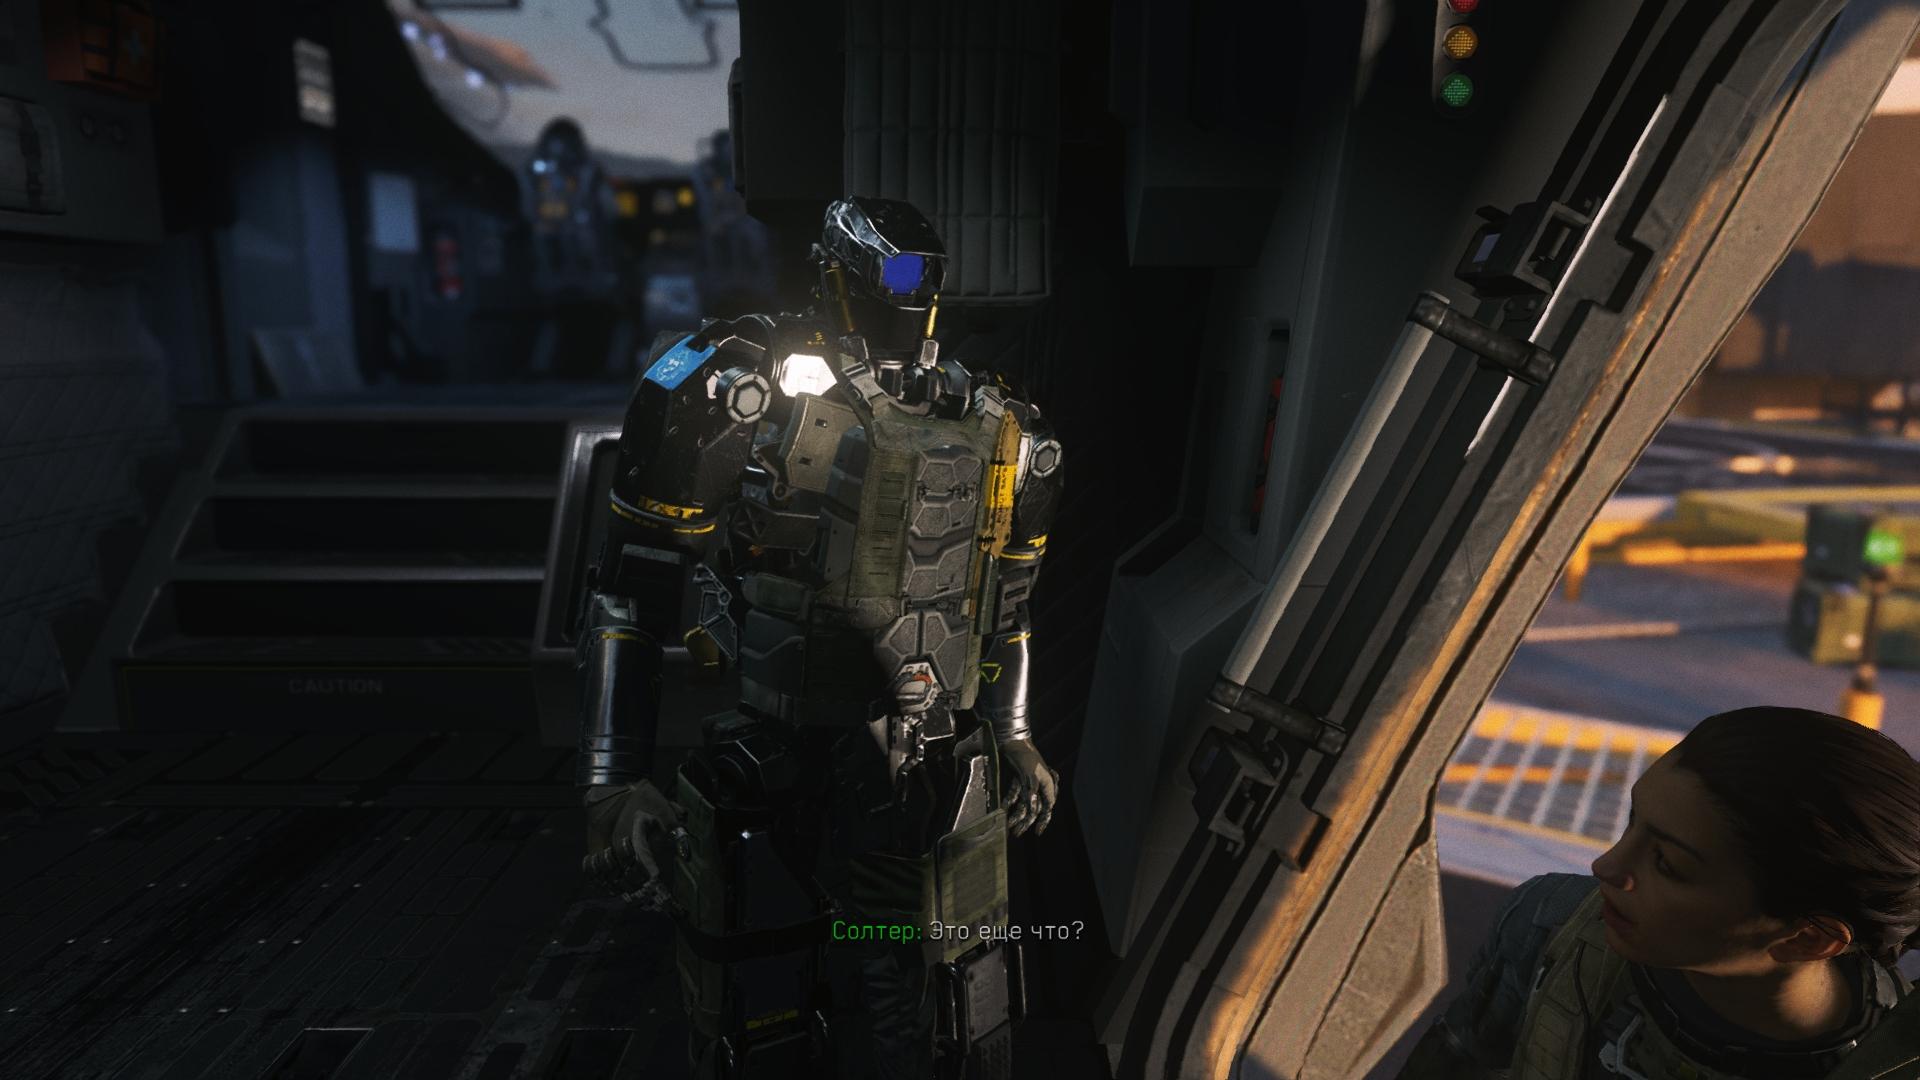 00015.Jpg - Call of Duty: Infinite Warfare